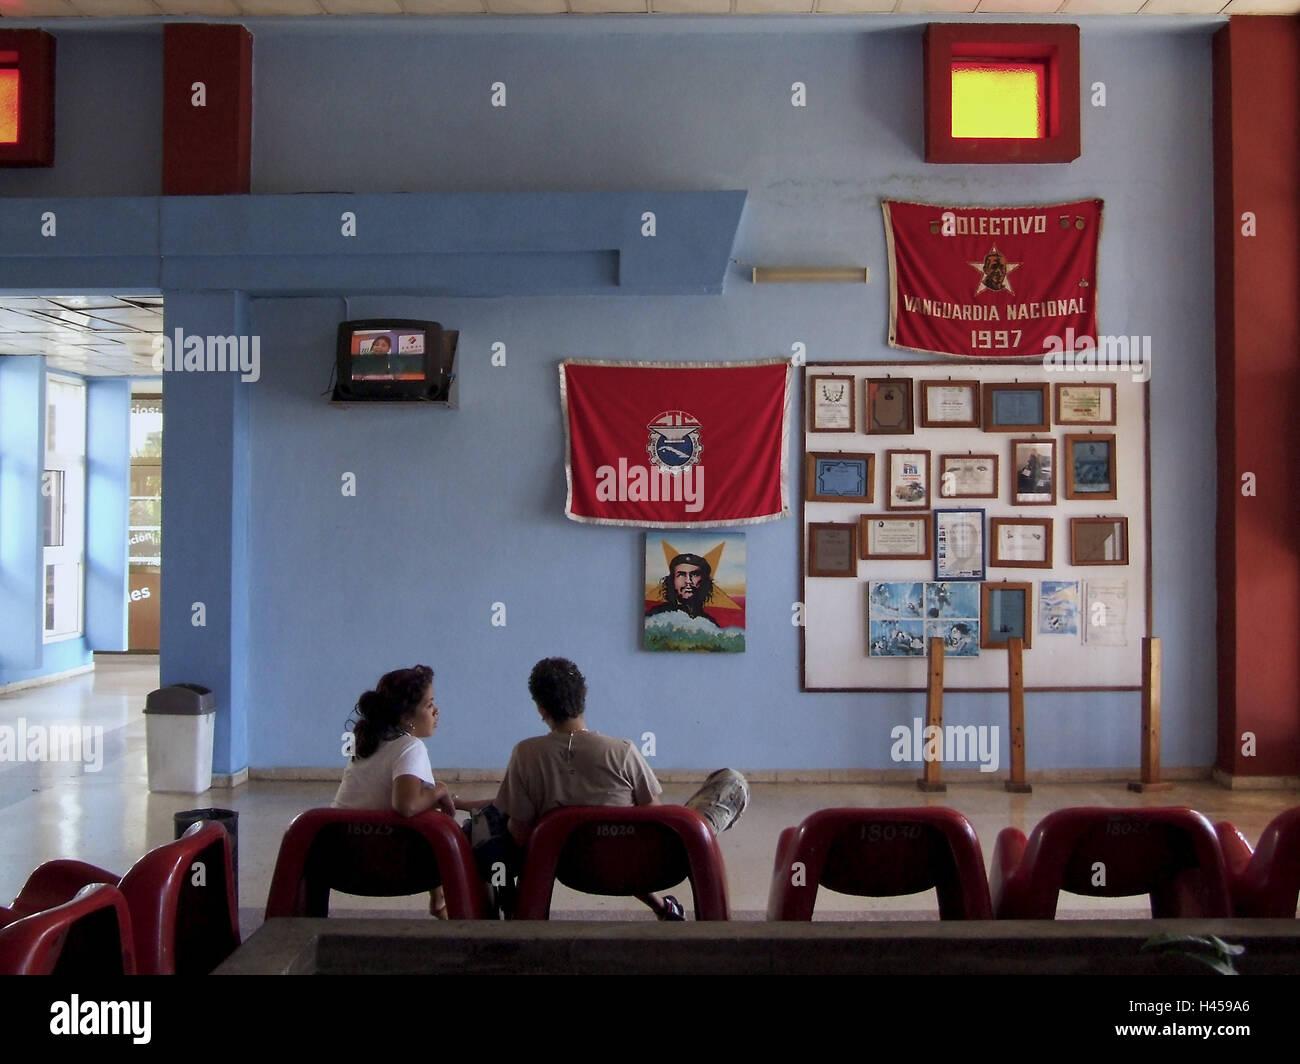 Waiting room, bus terminal, Varadero, Cuba, holiday destination, destination, the Caribbean, tourism, vacation, - Stock Image